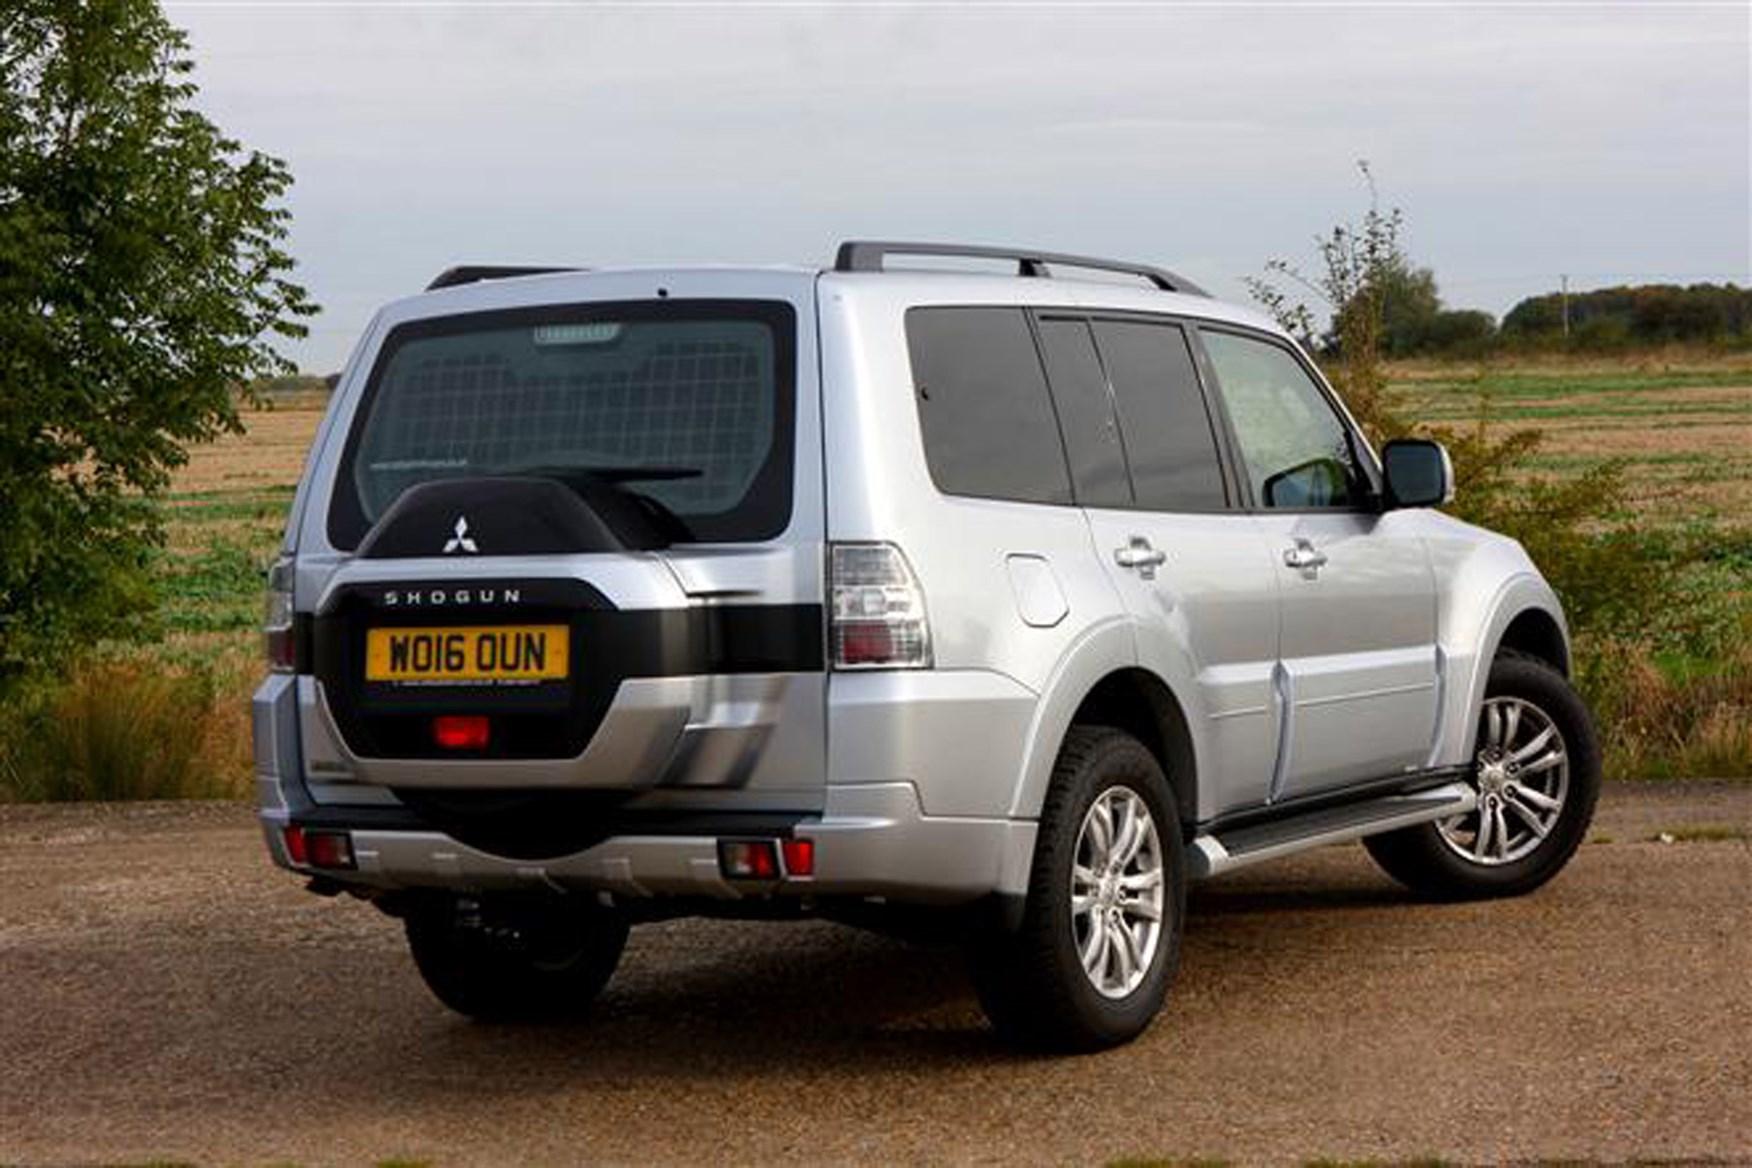 Mitsubishi Shogun review on Parkers Vans - rear exterior